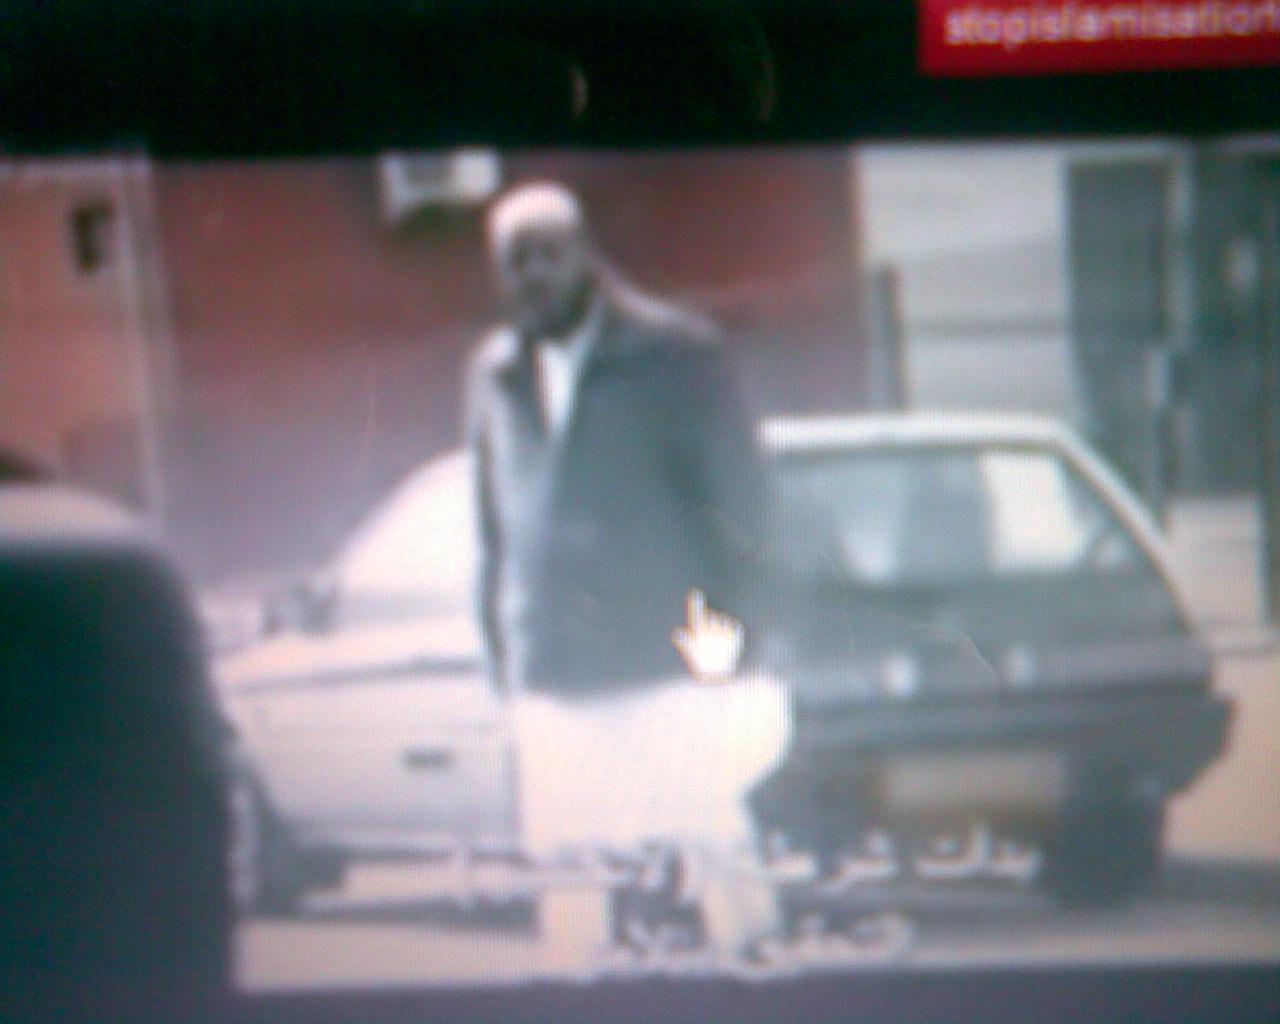 Islamic phedophile charged